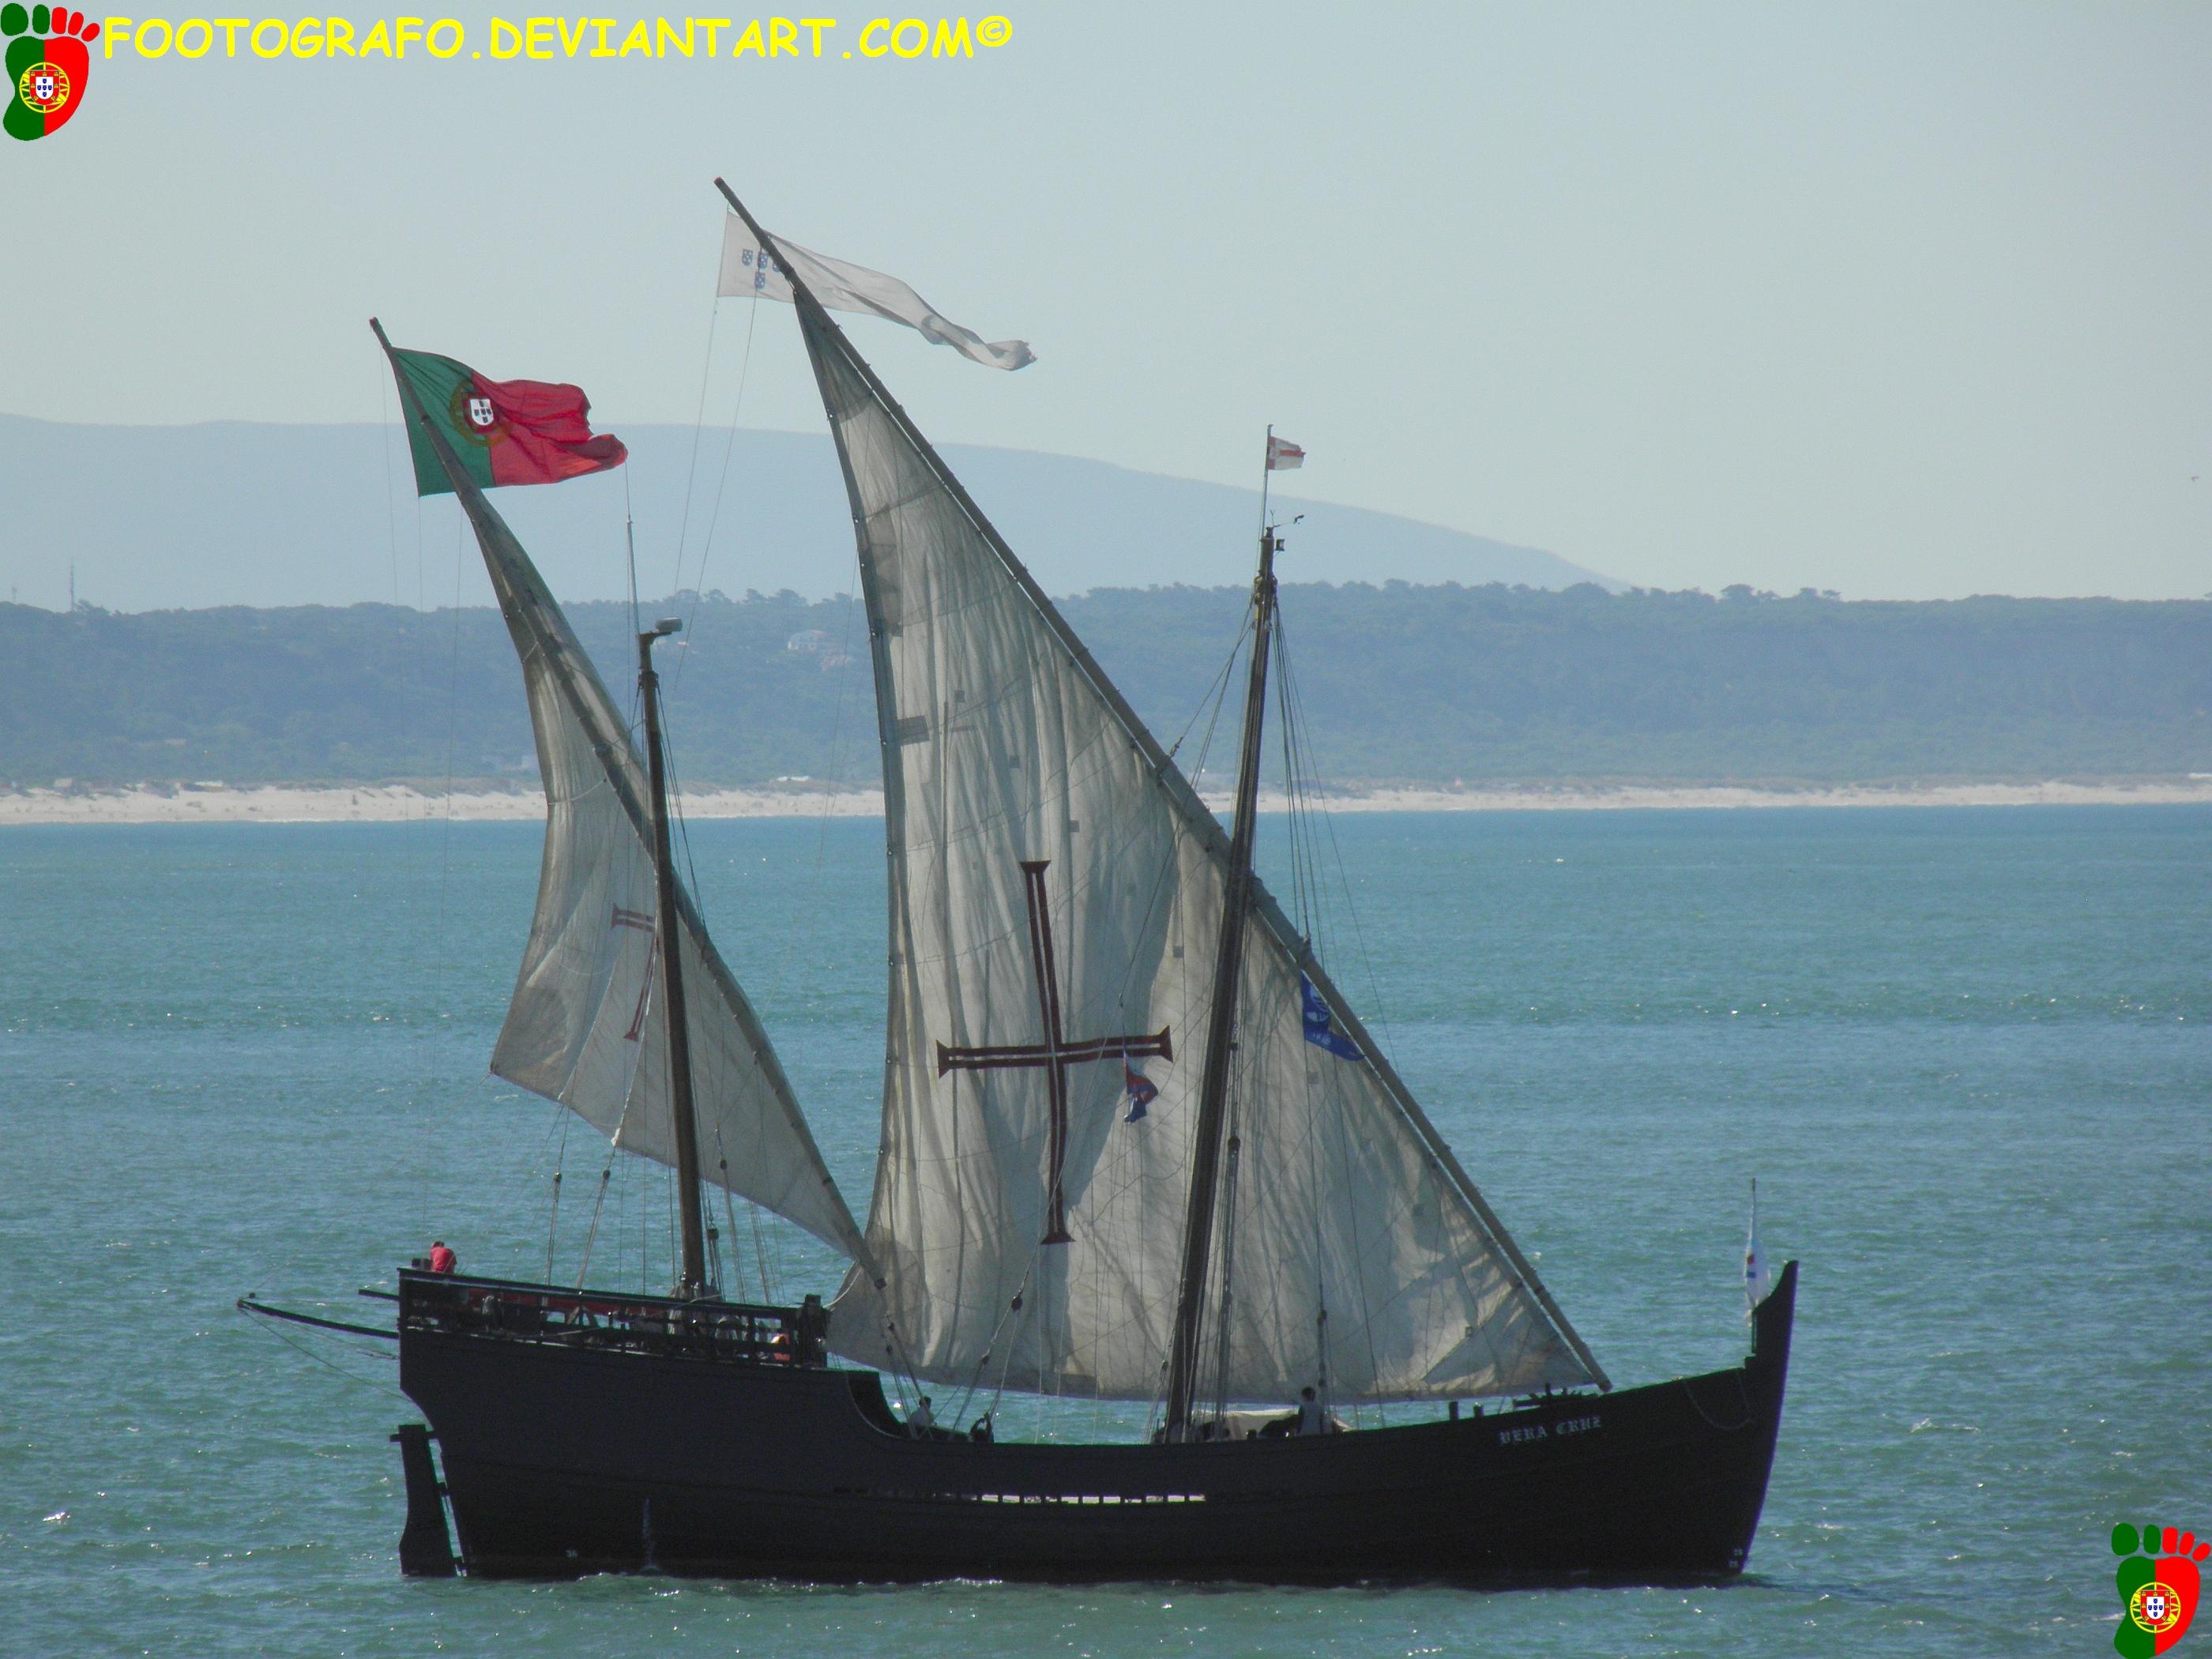 Caravel clipart small On 3 caravel victordleon Explore